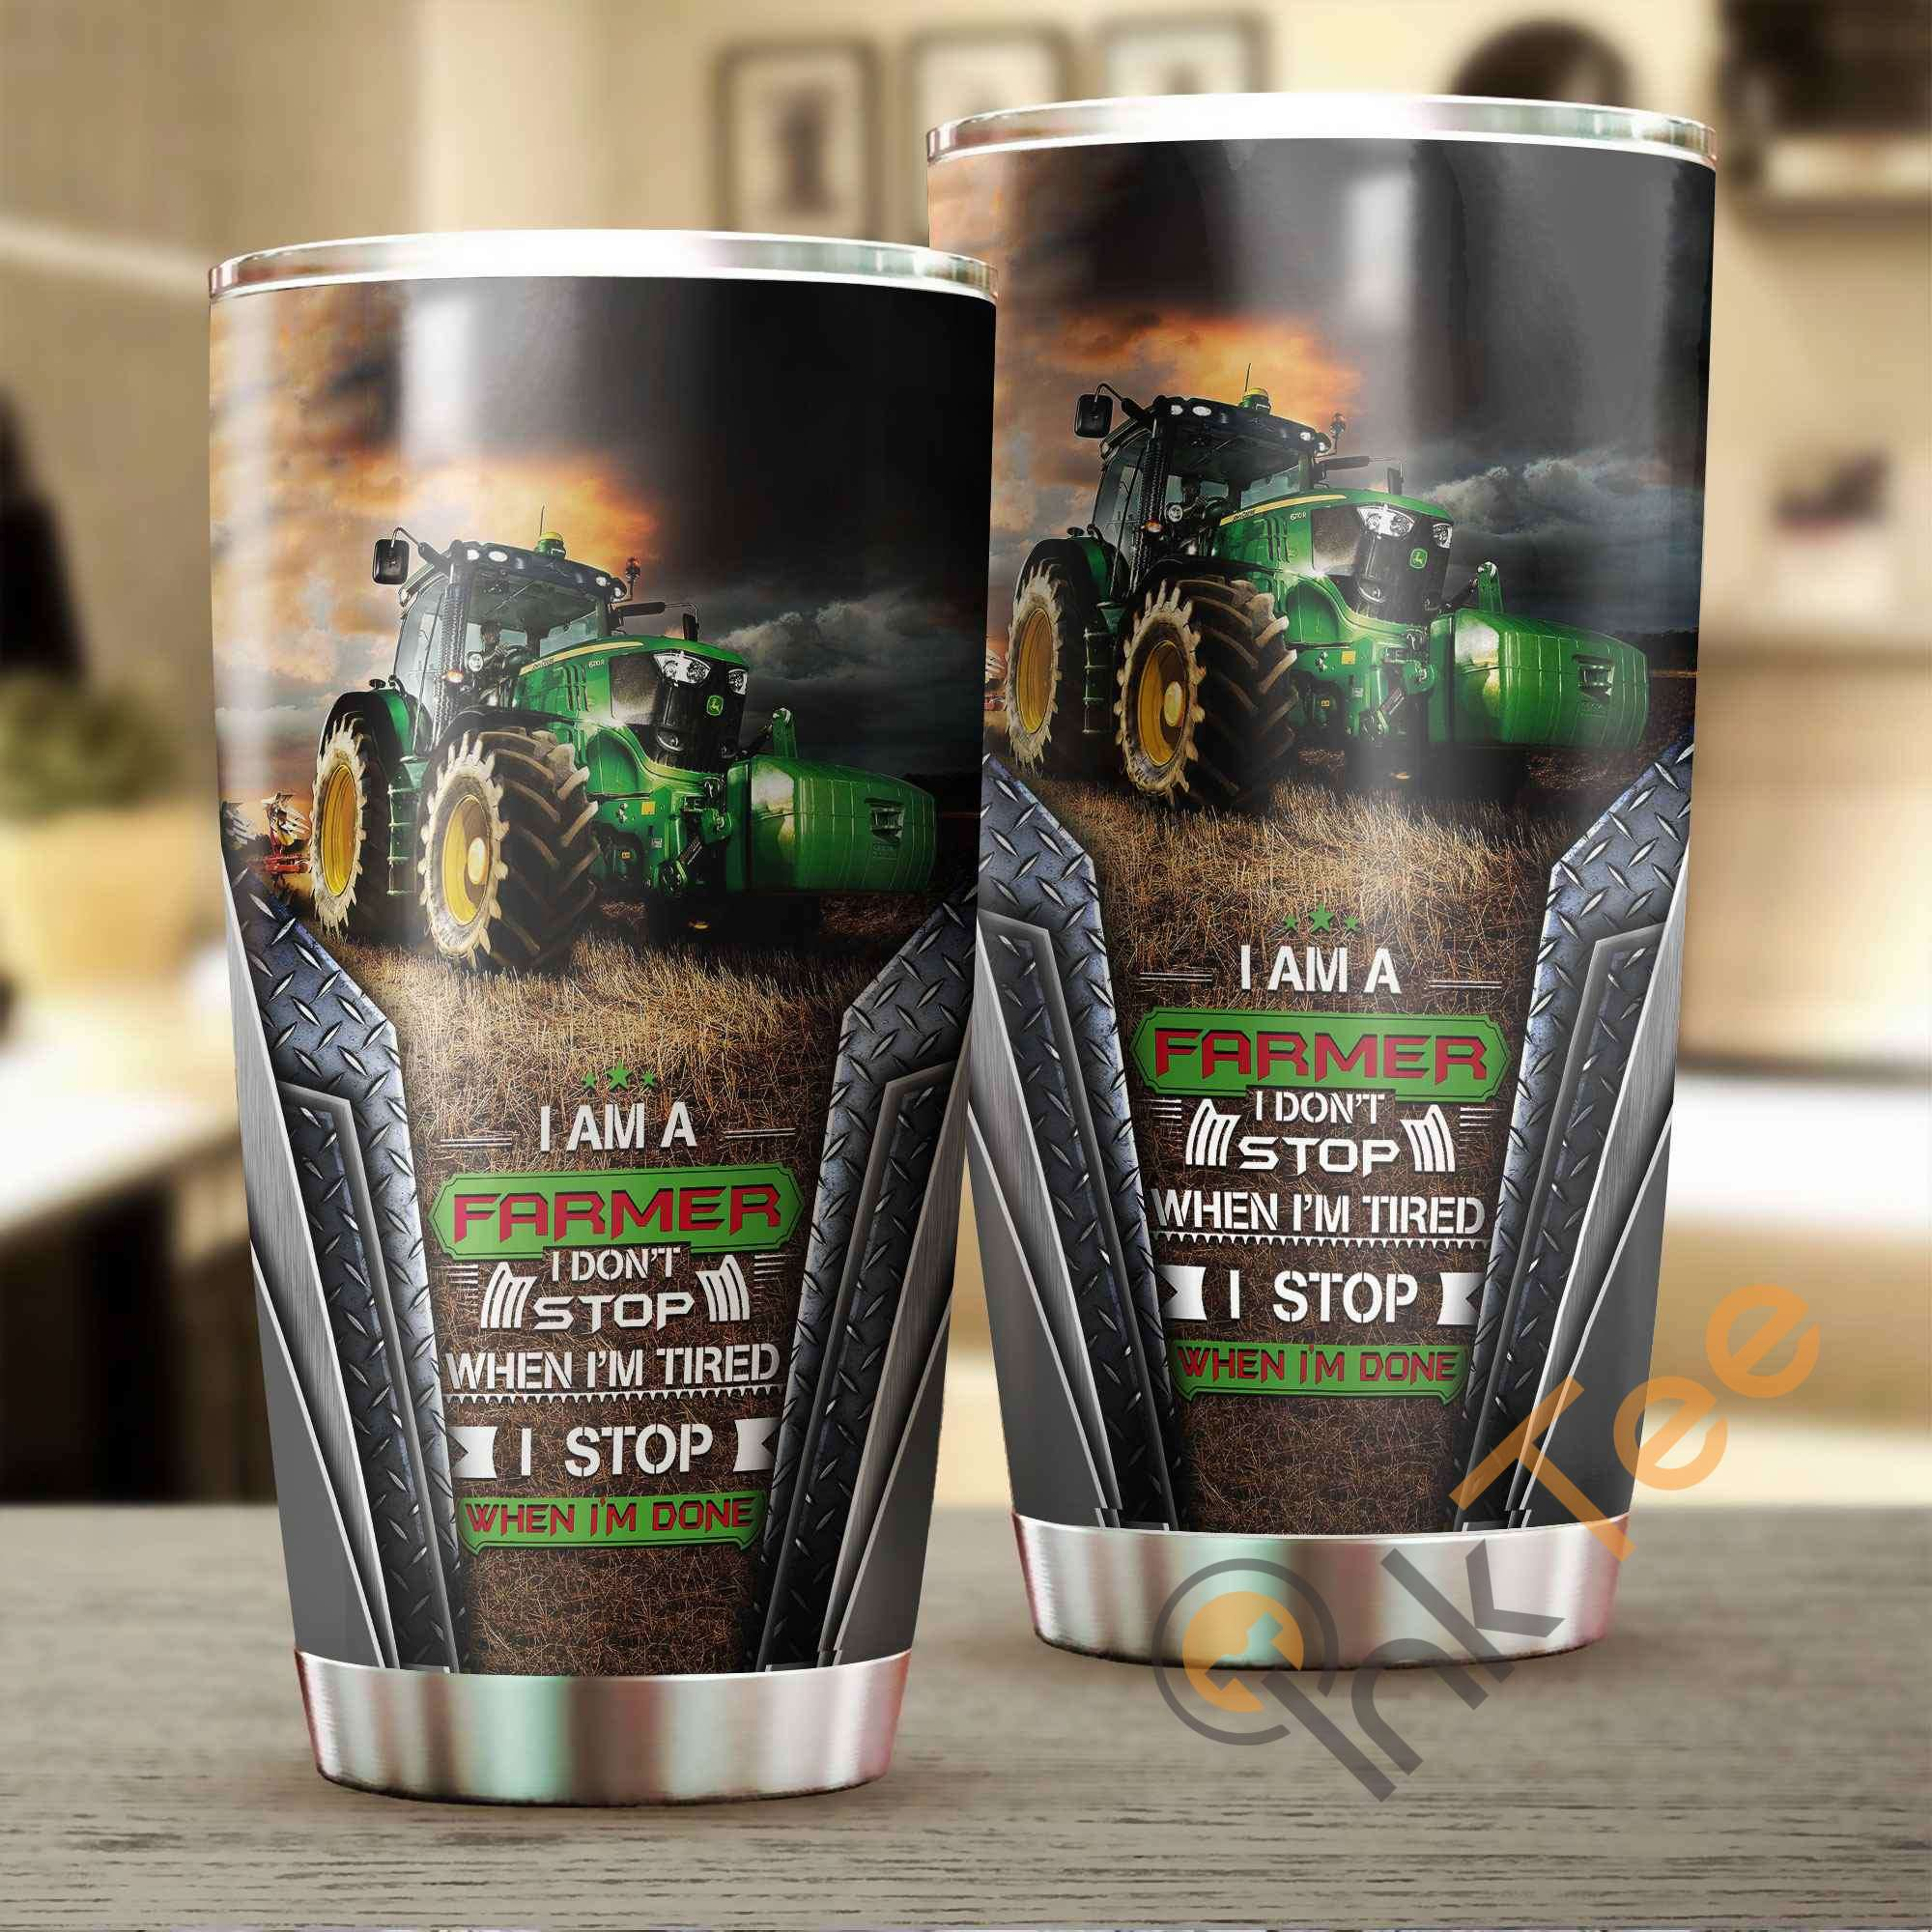 I Am A Farmer Amazon Best Seller Sku 3152 Stainless Steel Tumbler